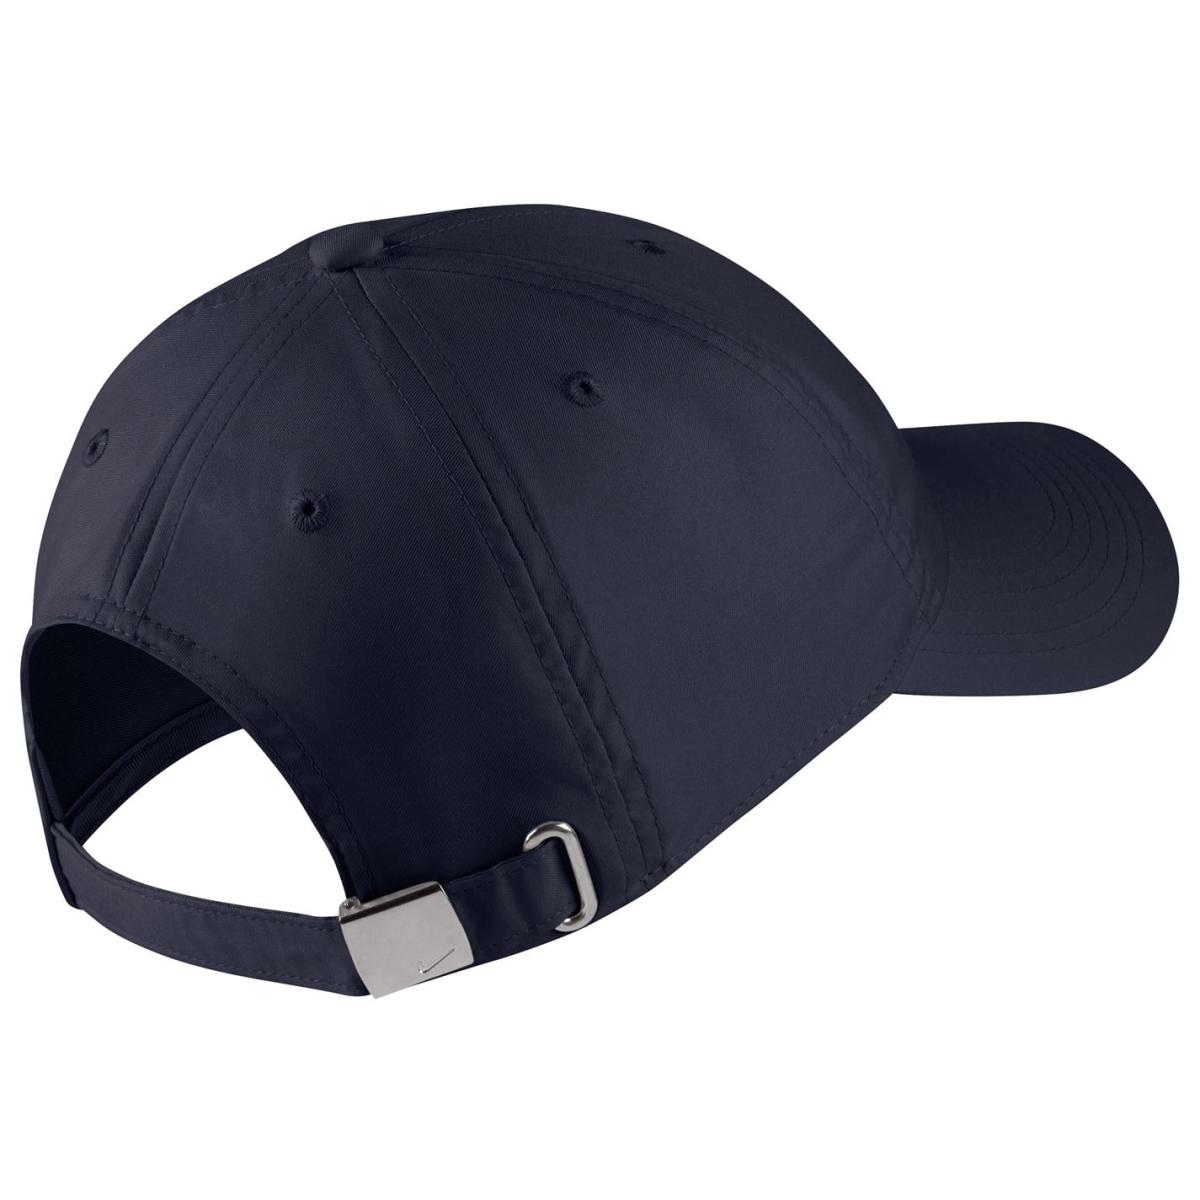 Nike Swoosh Kappe Baseball Caps Basecap Kinder Jungen 1884